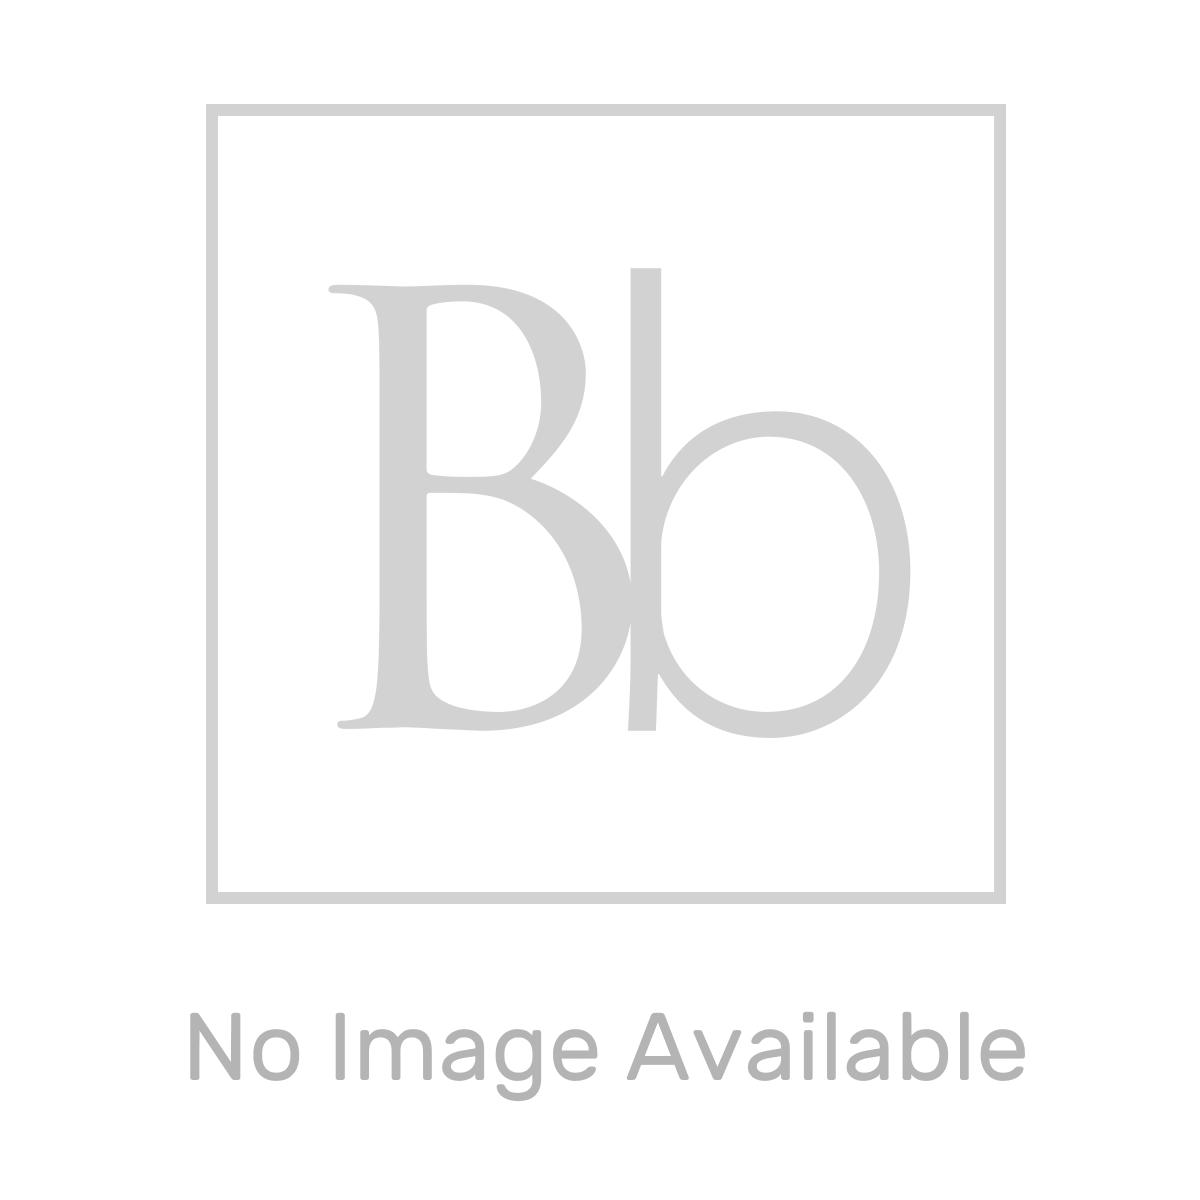 Premier Vault Natural Oak Compact Vanity Unit 400mm